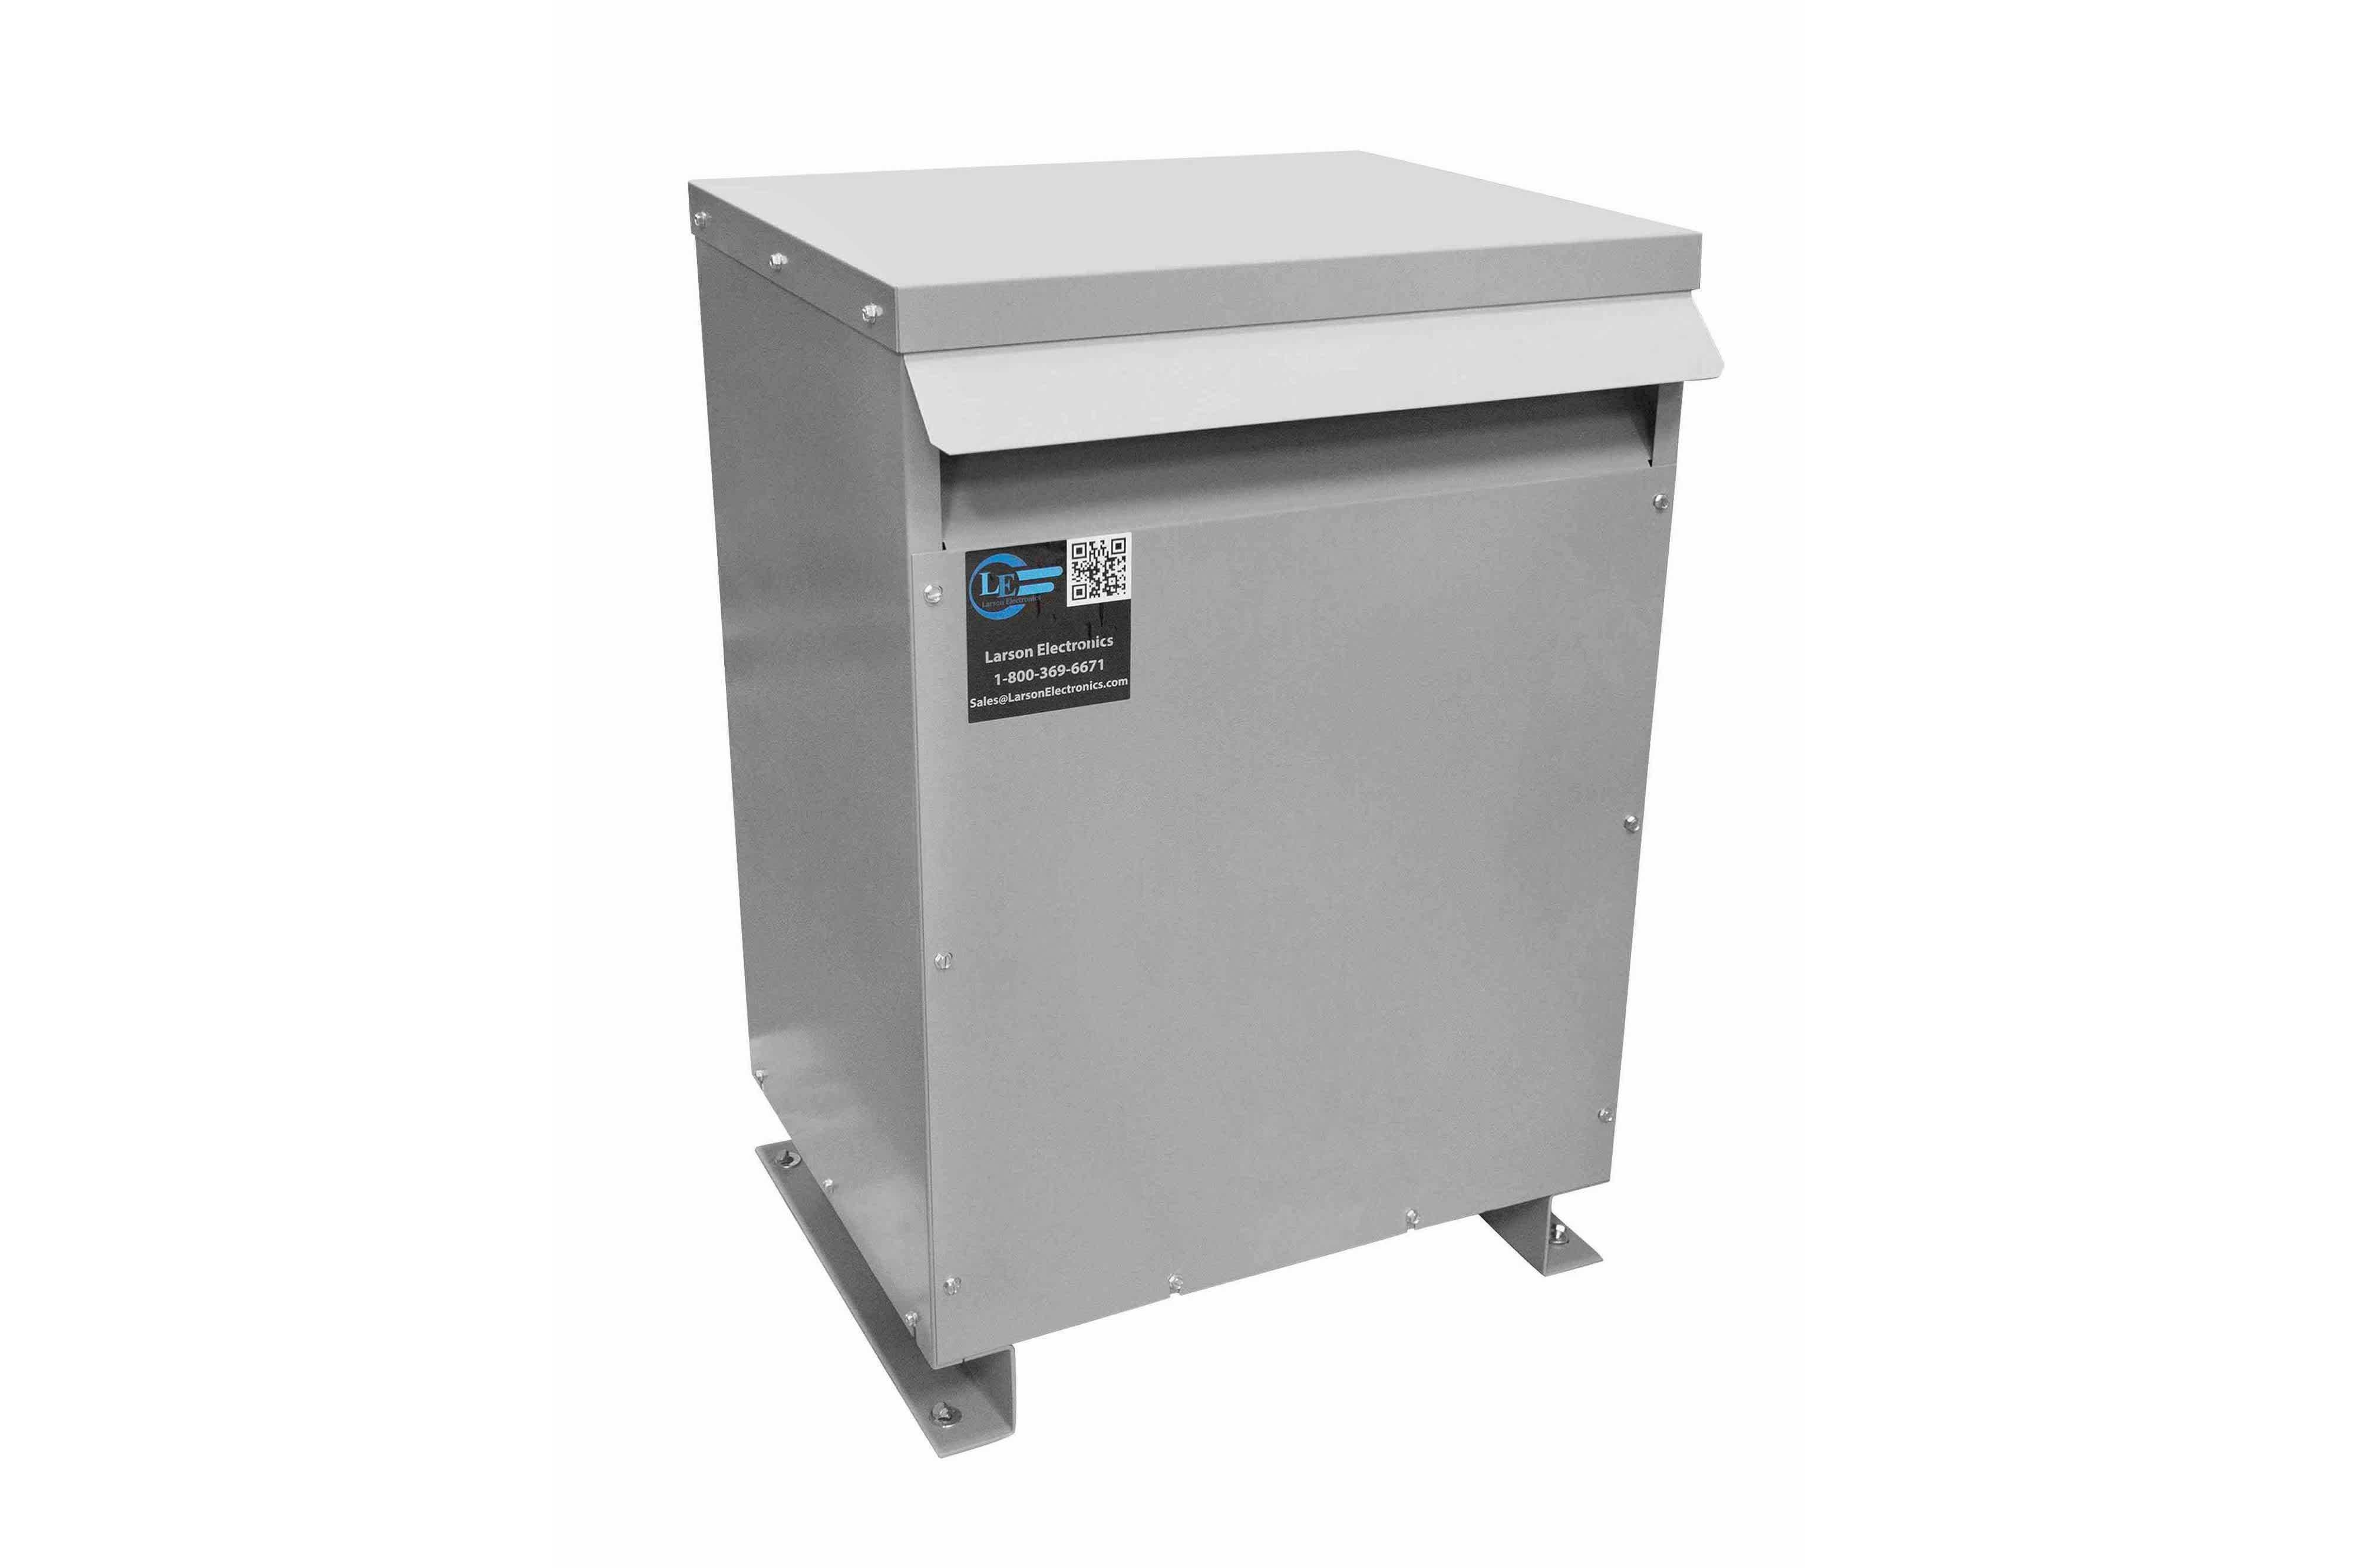 10 kVA 3PH Isolation Transformer, 460V Wye Primary, 380Y/220 Wye-N Secondary, N3R, Ventilated, 60 Hz